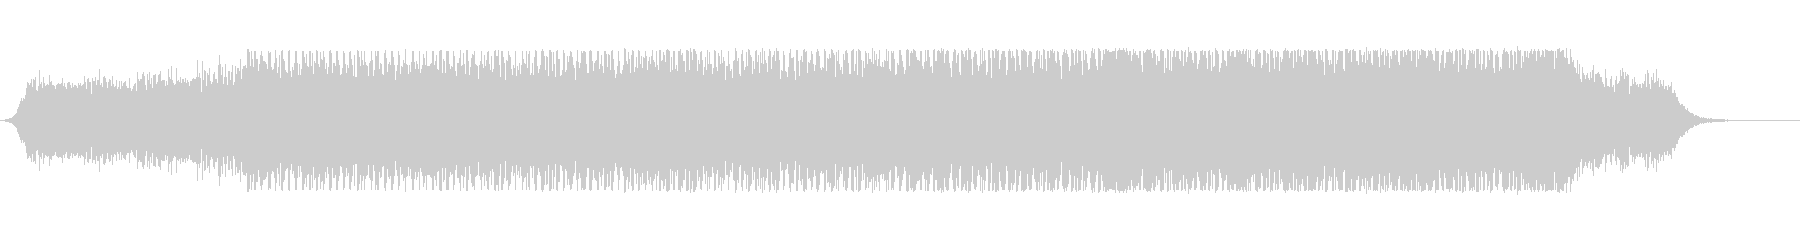 bpm140の不気味な雰囲気のテクノの未再生の波形